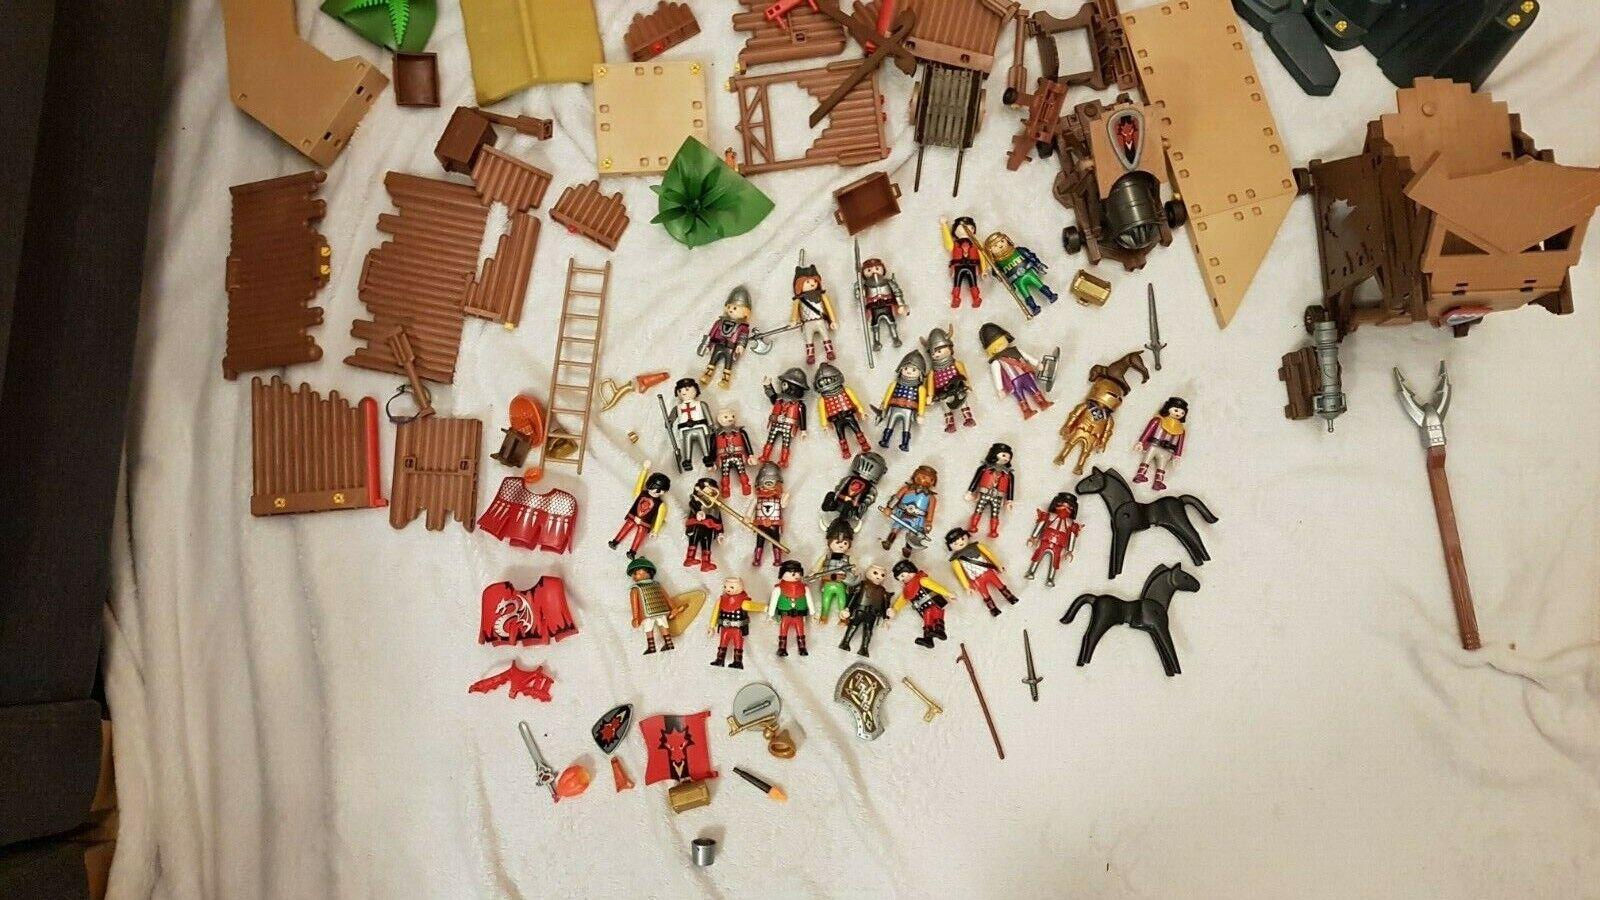 Playmobil - WikingerFestung +Babaren+ Ritter+Zubehör Set Gebraucht